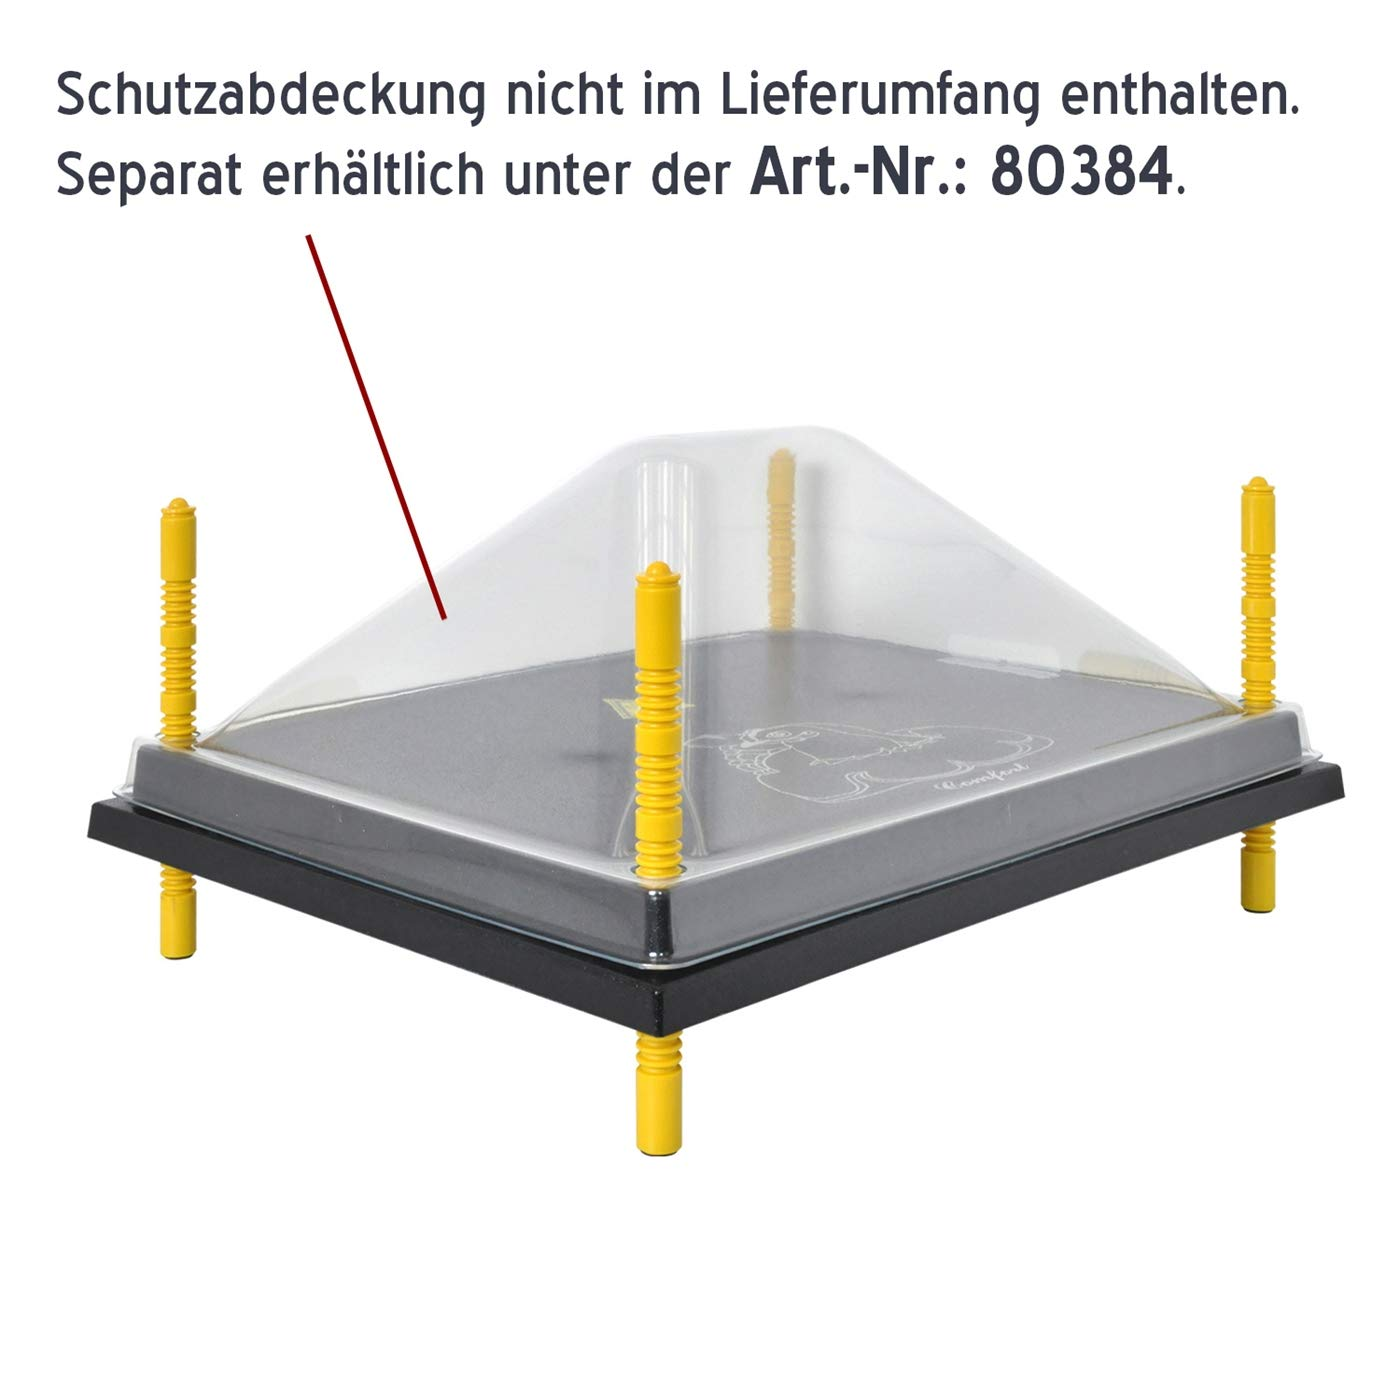 Heizplatte Inkubator Heizmatte 50 Watt Heizkabel K/ükenw/ärmer Kunstglucke W/ärmebirne K/üken-W/ärmeplatte Comfort 40 x 50 cm